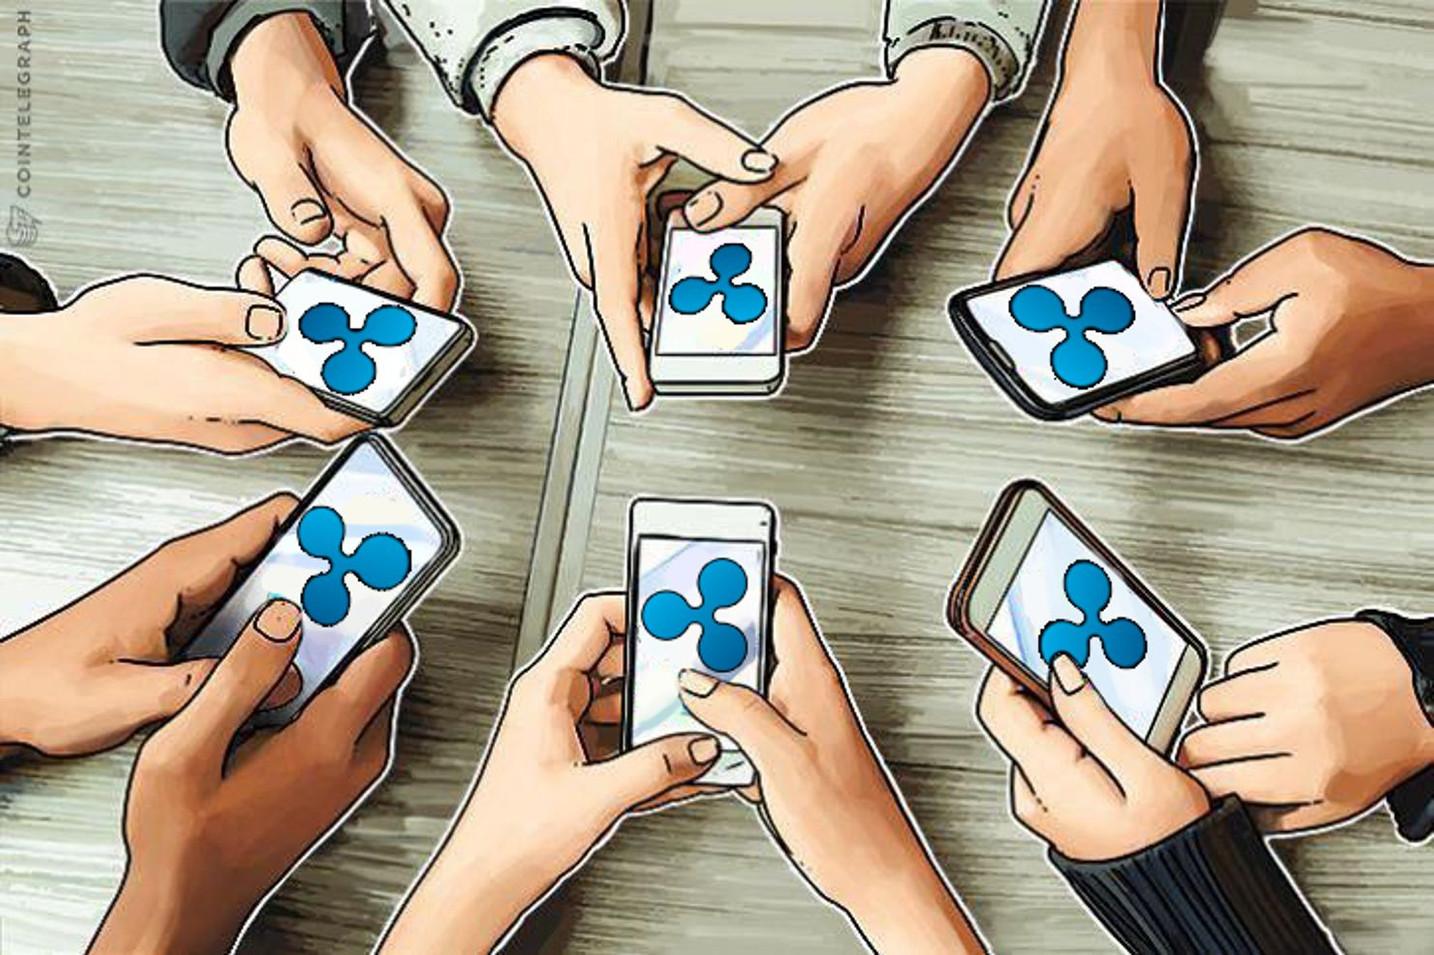 SBI 銀行間送金アプリ「マネータップ」を法人化。仮想通貨XRP採用に向けて前進か